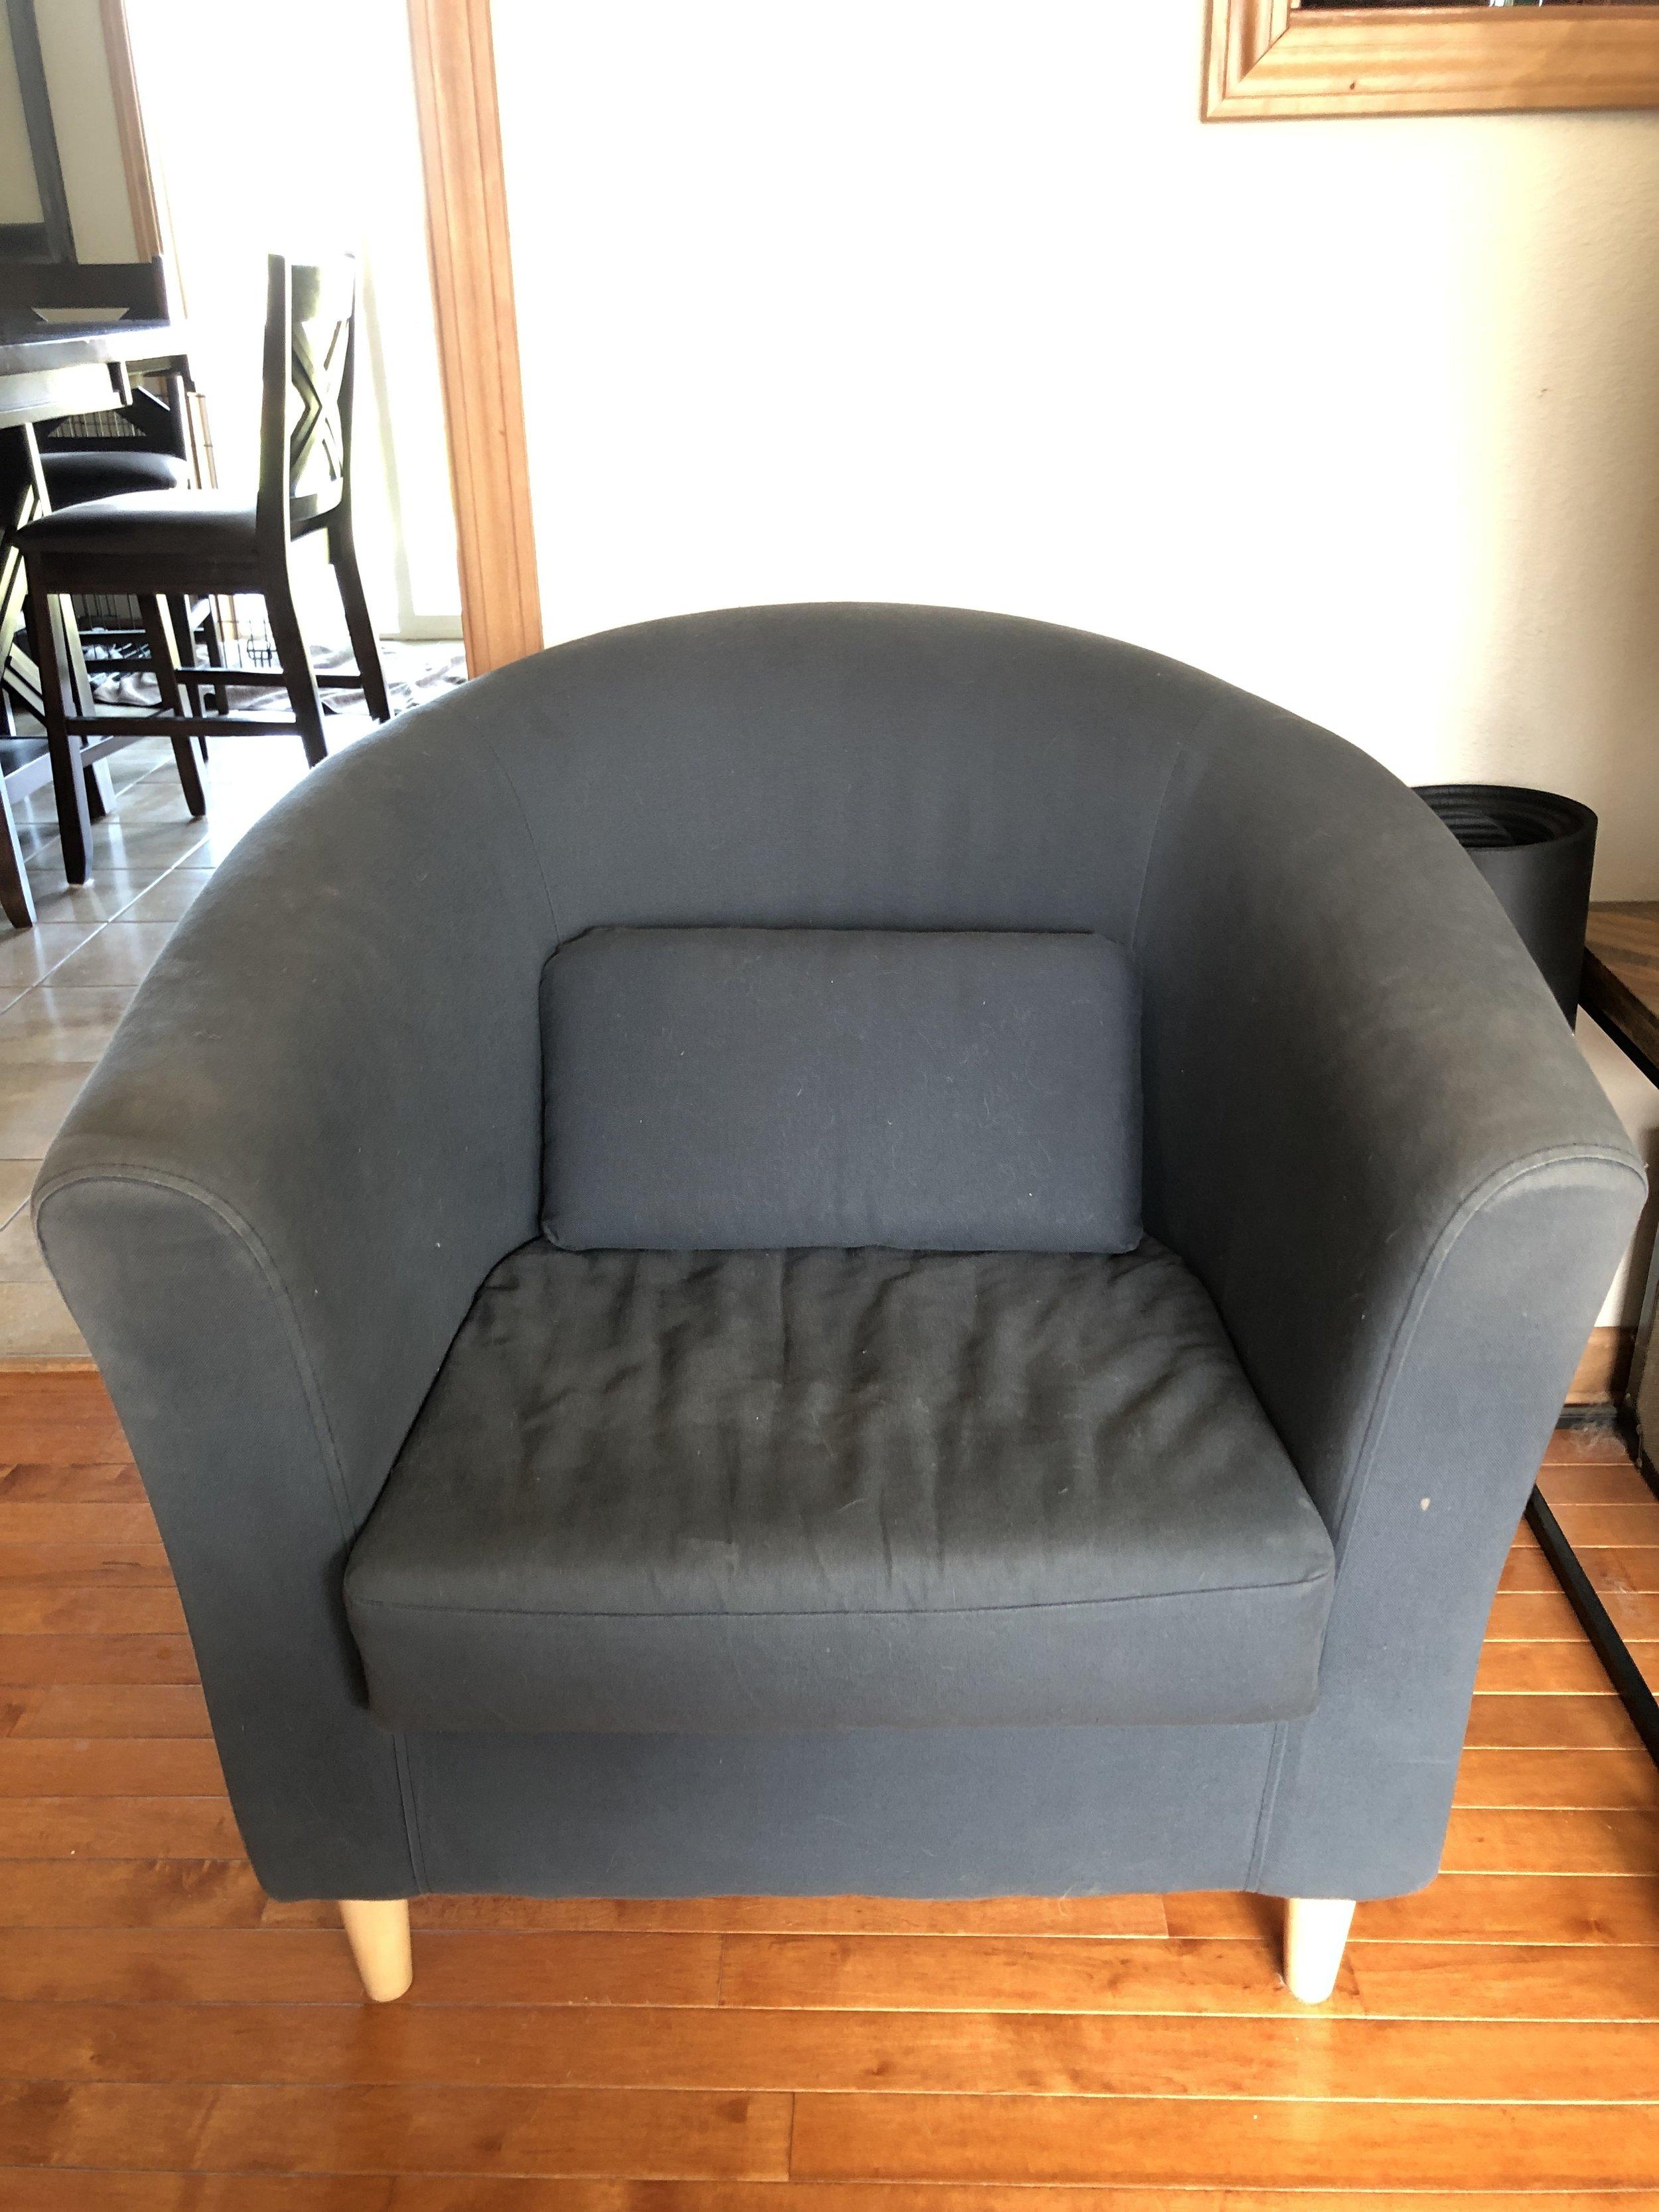 Upholstery cleaning everett before